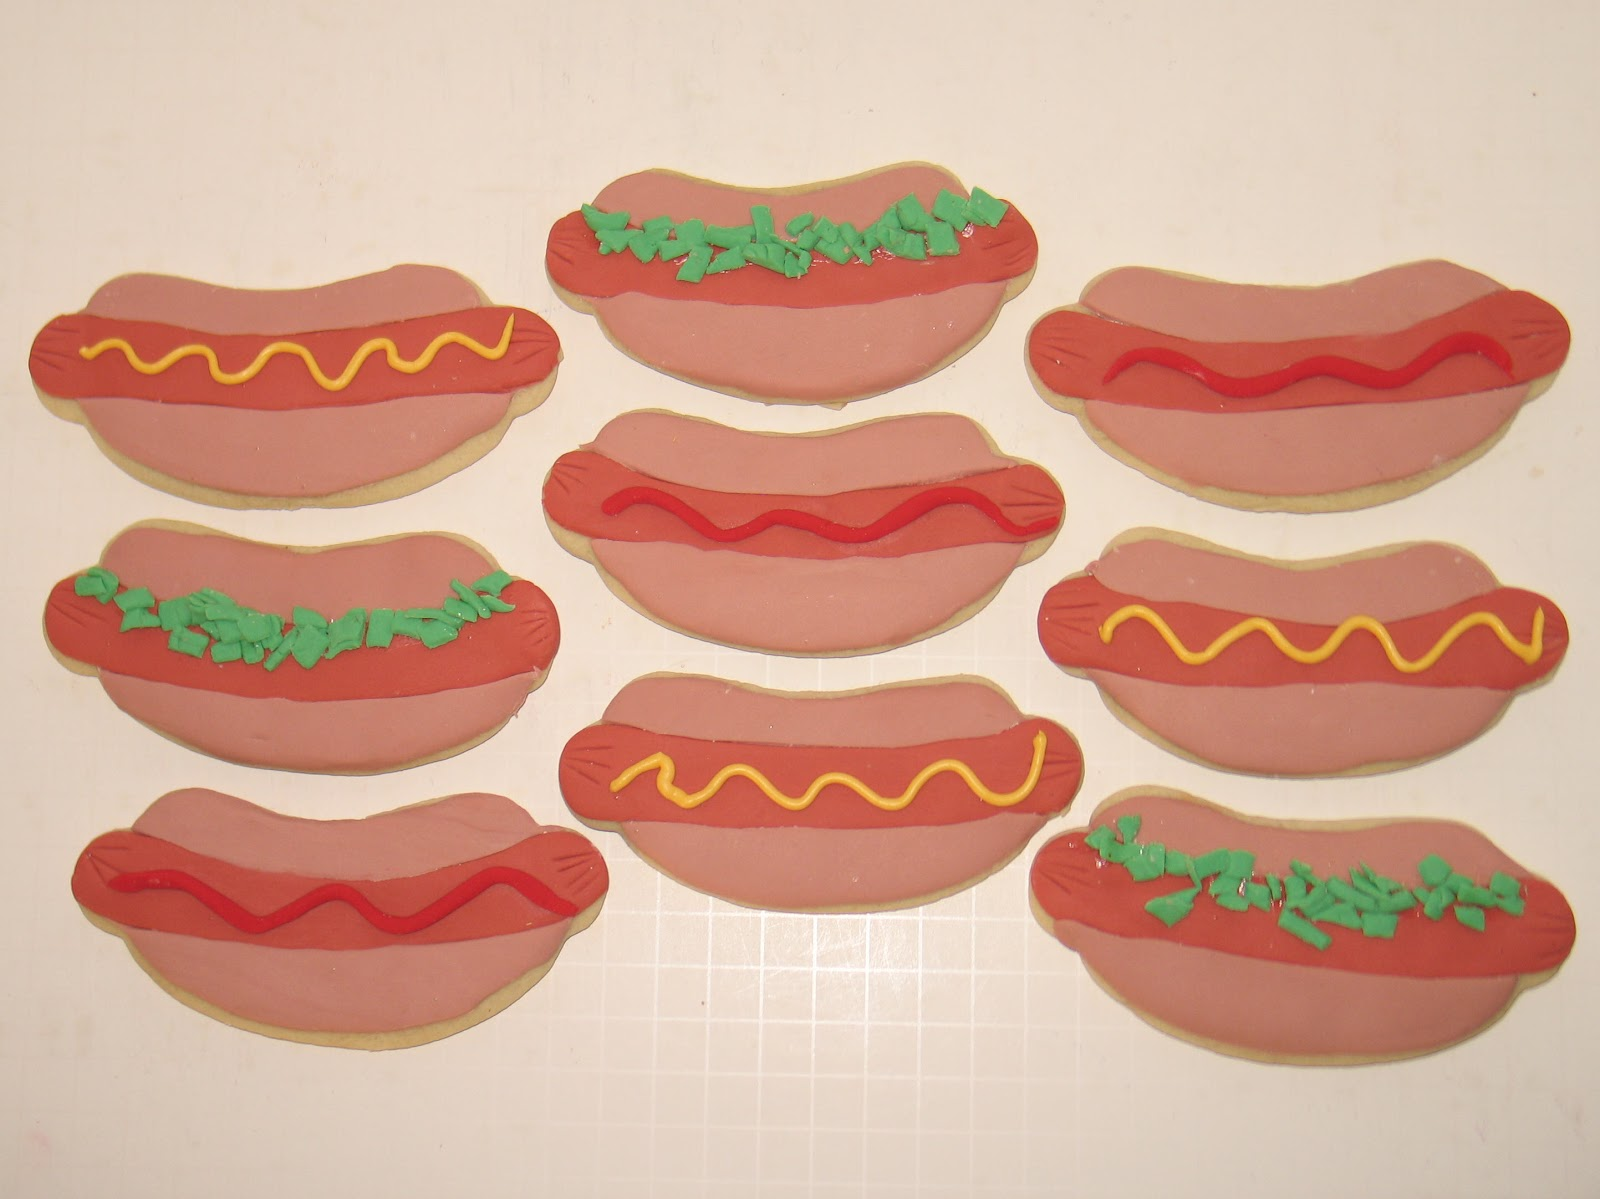 ... cookies hot dog sugar cookies hot dog cookie hot dog cookies hot dog